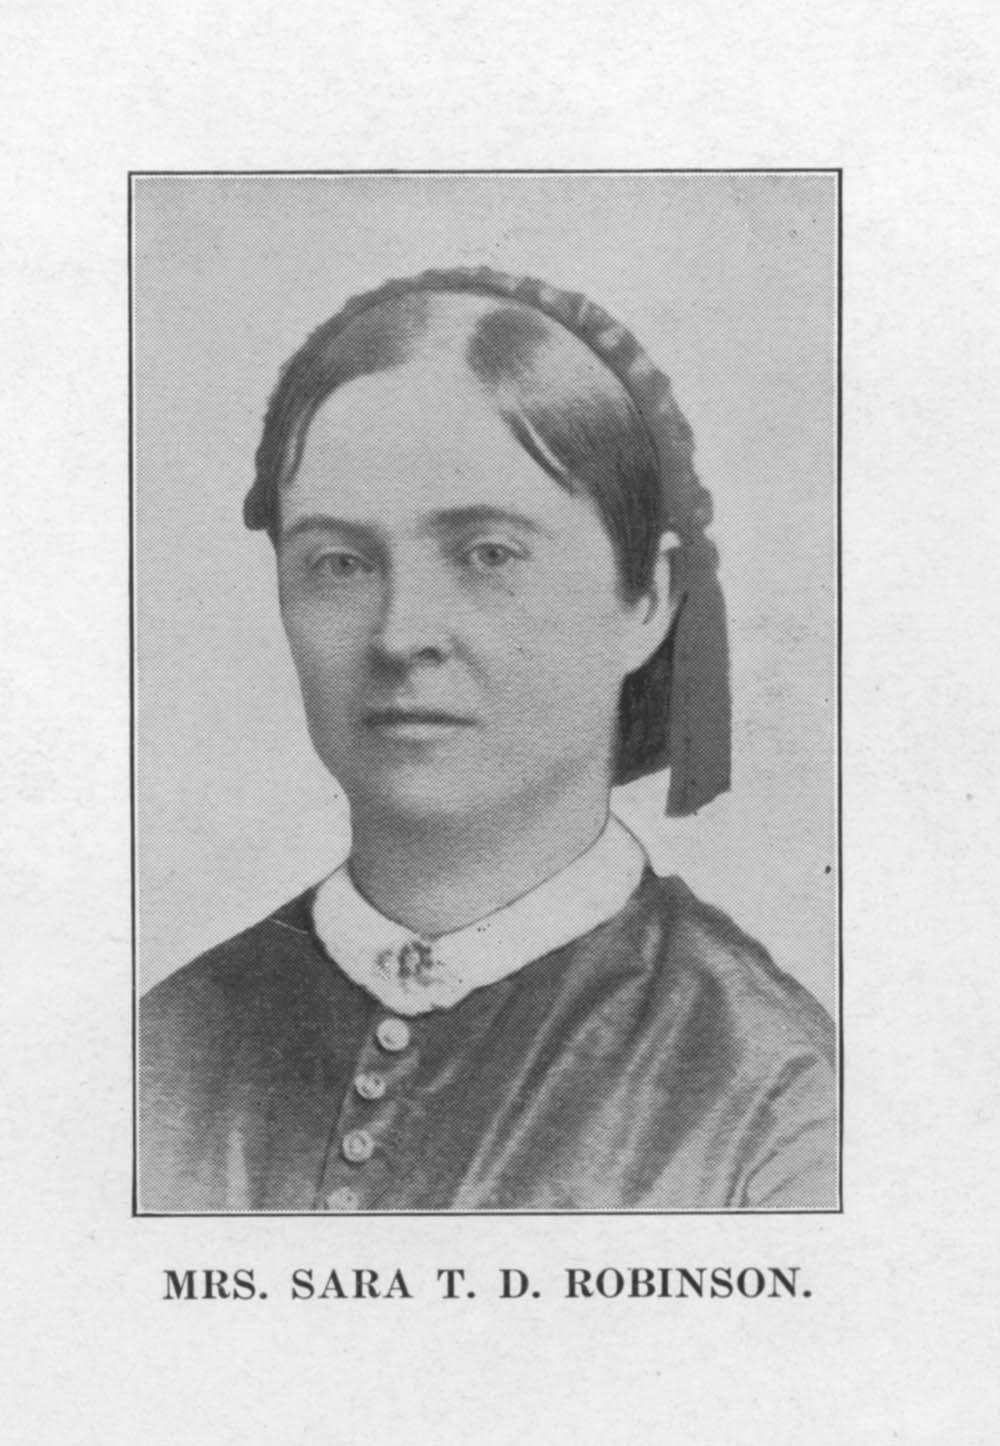 Sara Tappan Lawrence Robinson